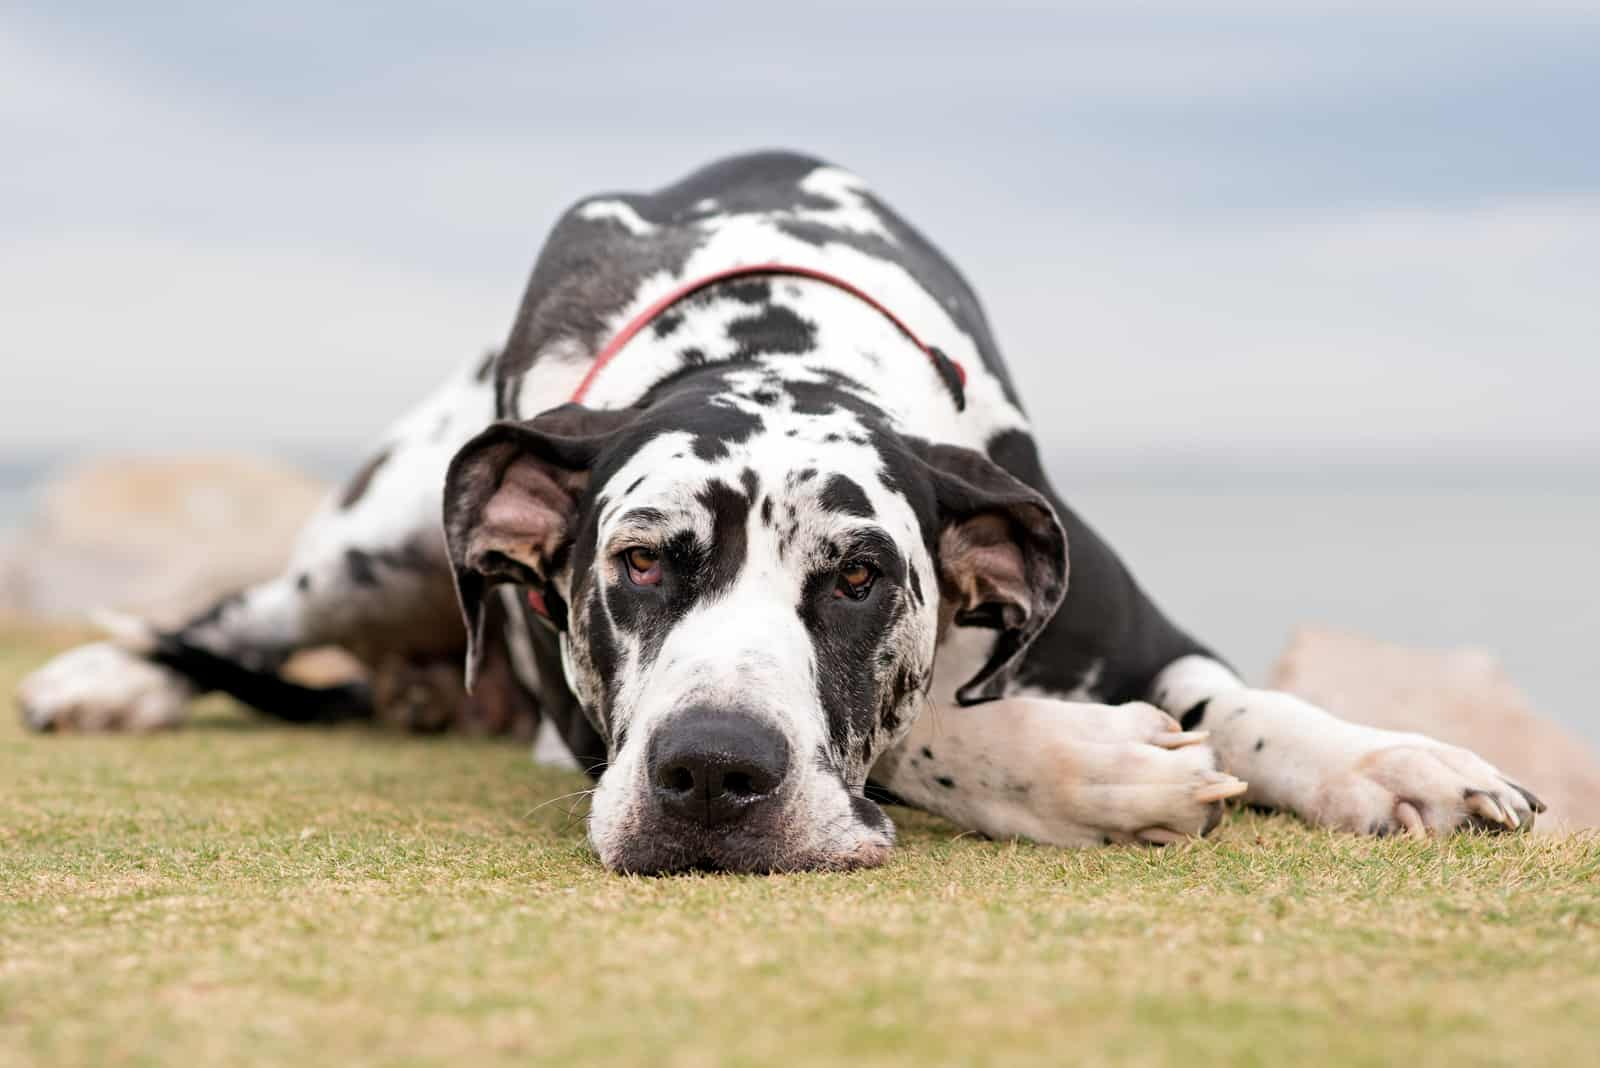 Harlequin Great Dane laying on ground